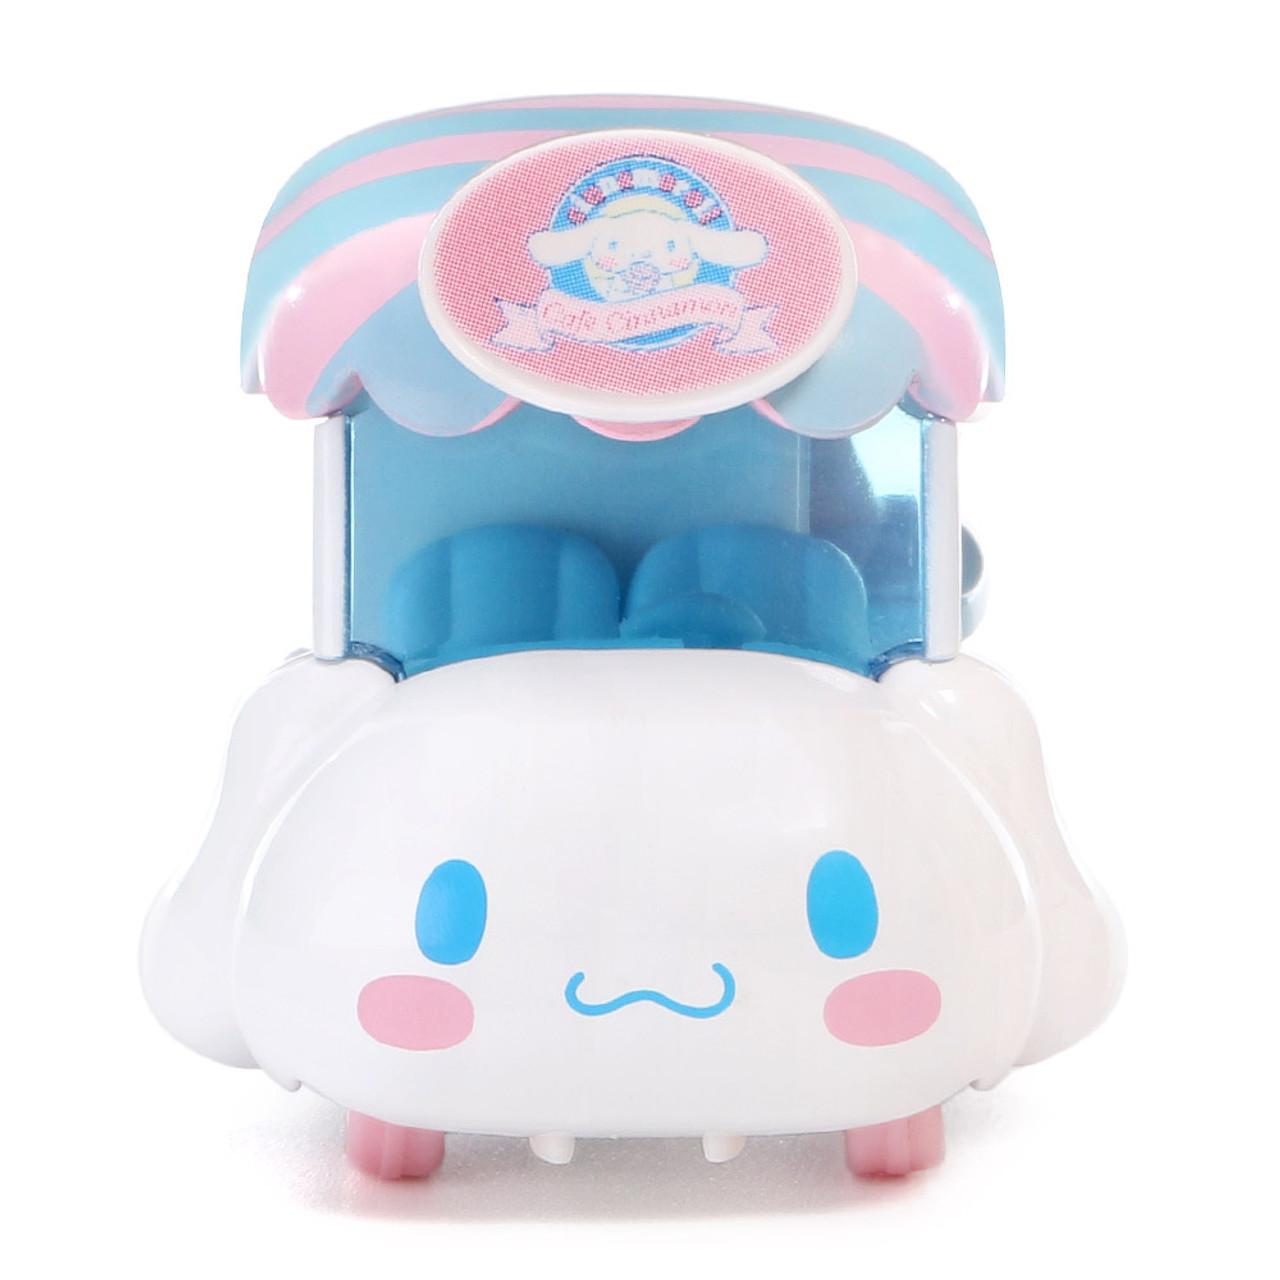 Tomica Sanrio Cinnamoroll Big Ears Dog Mini Food Truck Toy Car ( Front View )